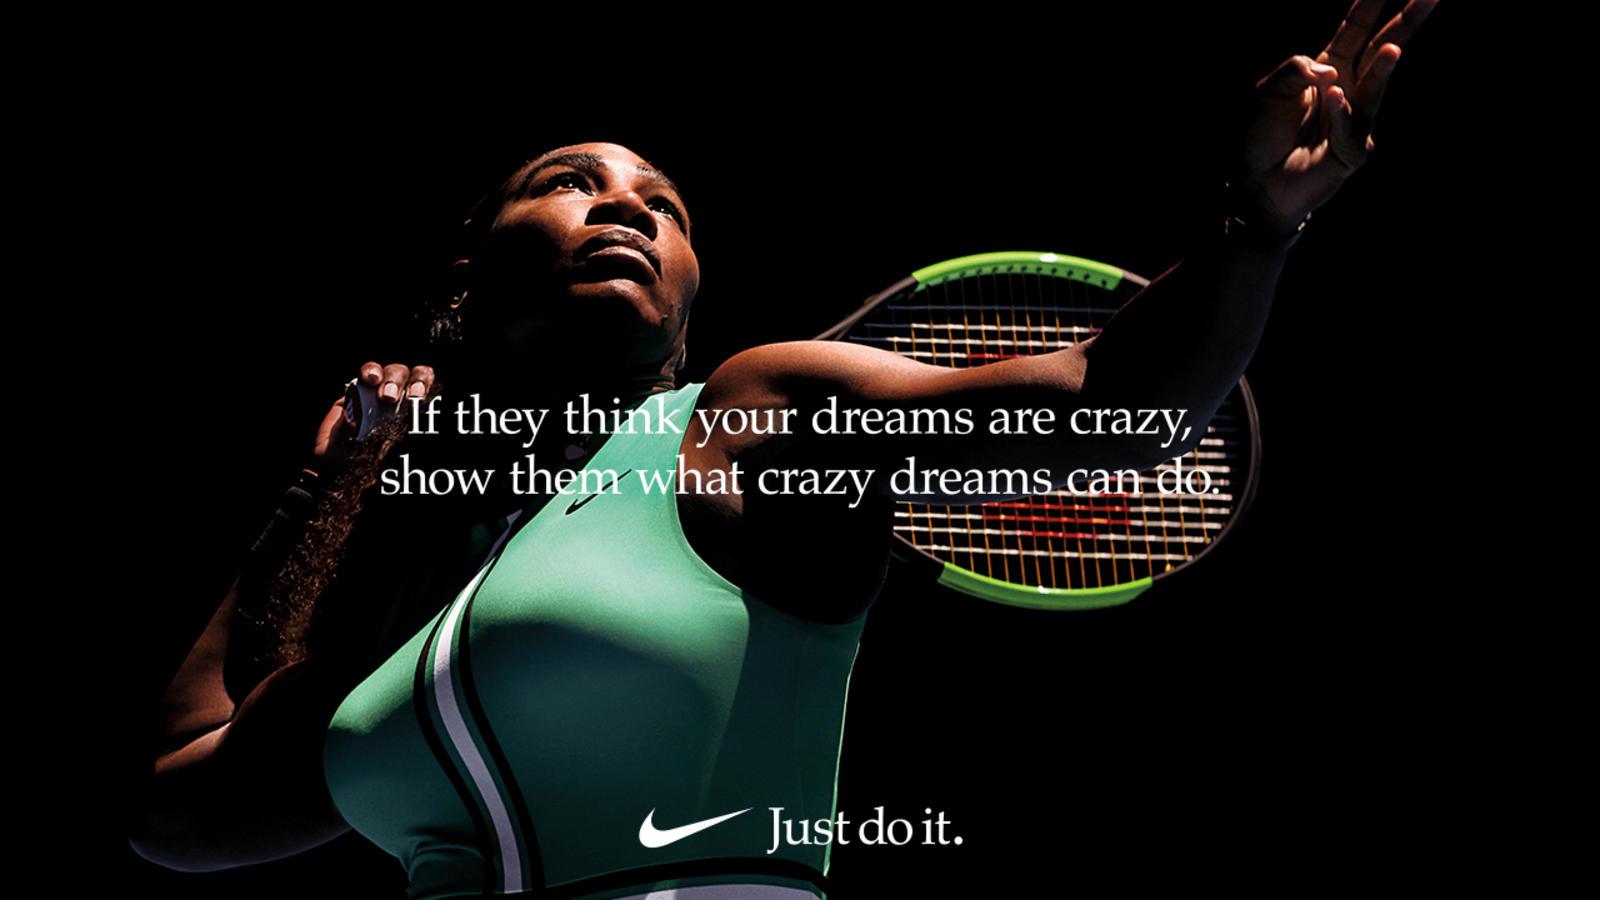 Serena_Williams_Twitter_85680.jpg